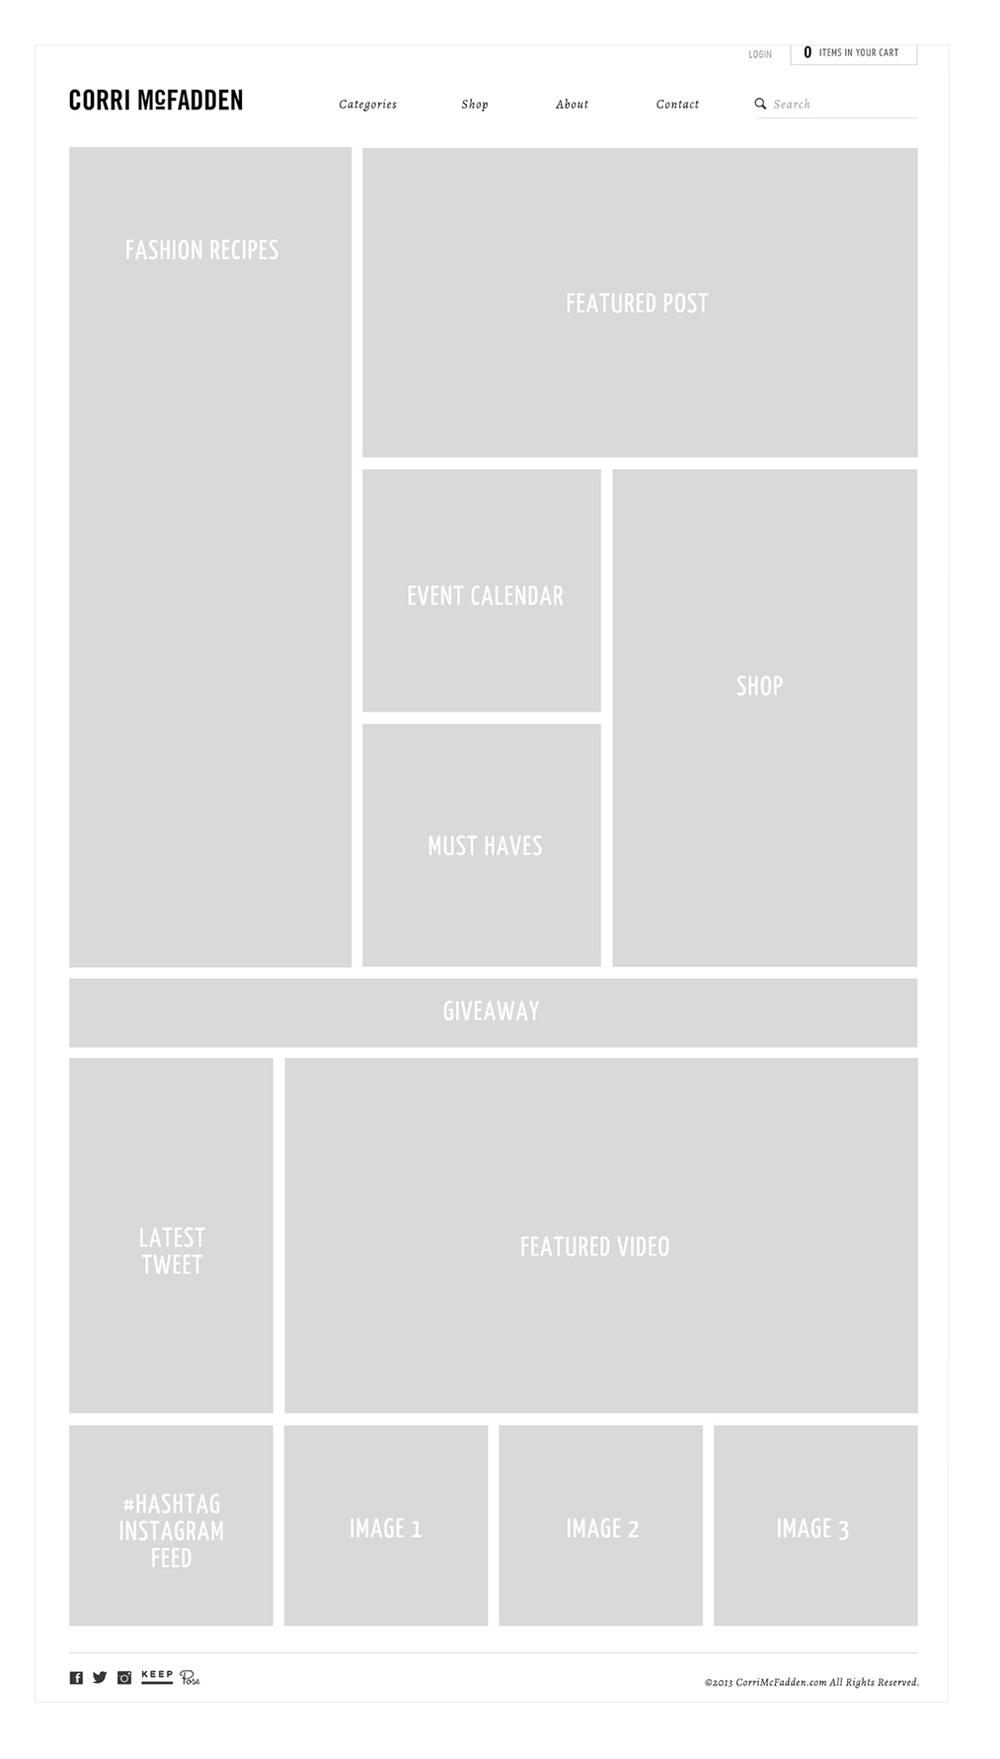 zmaic-corri-mcfadden_website-strategy-content-wireframes-ui-ux-design.jpg